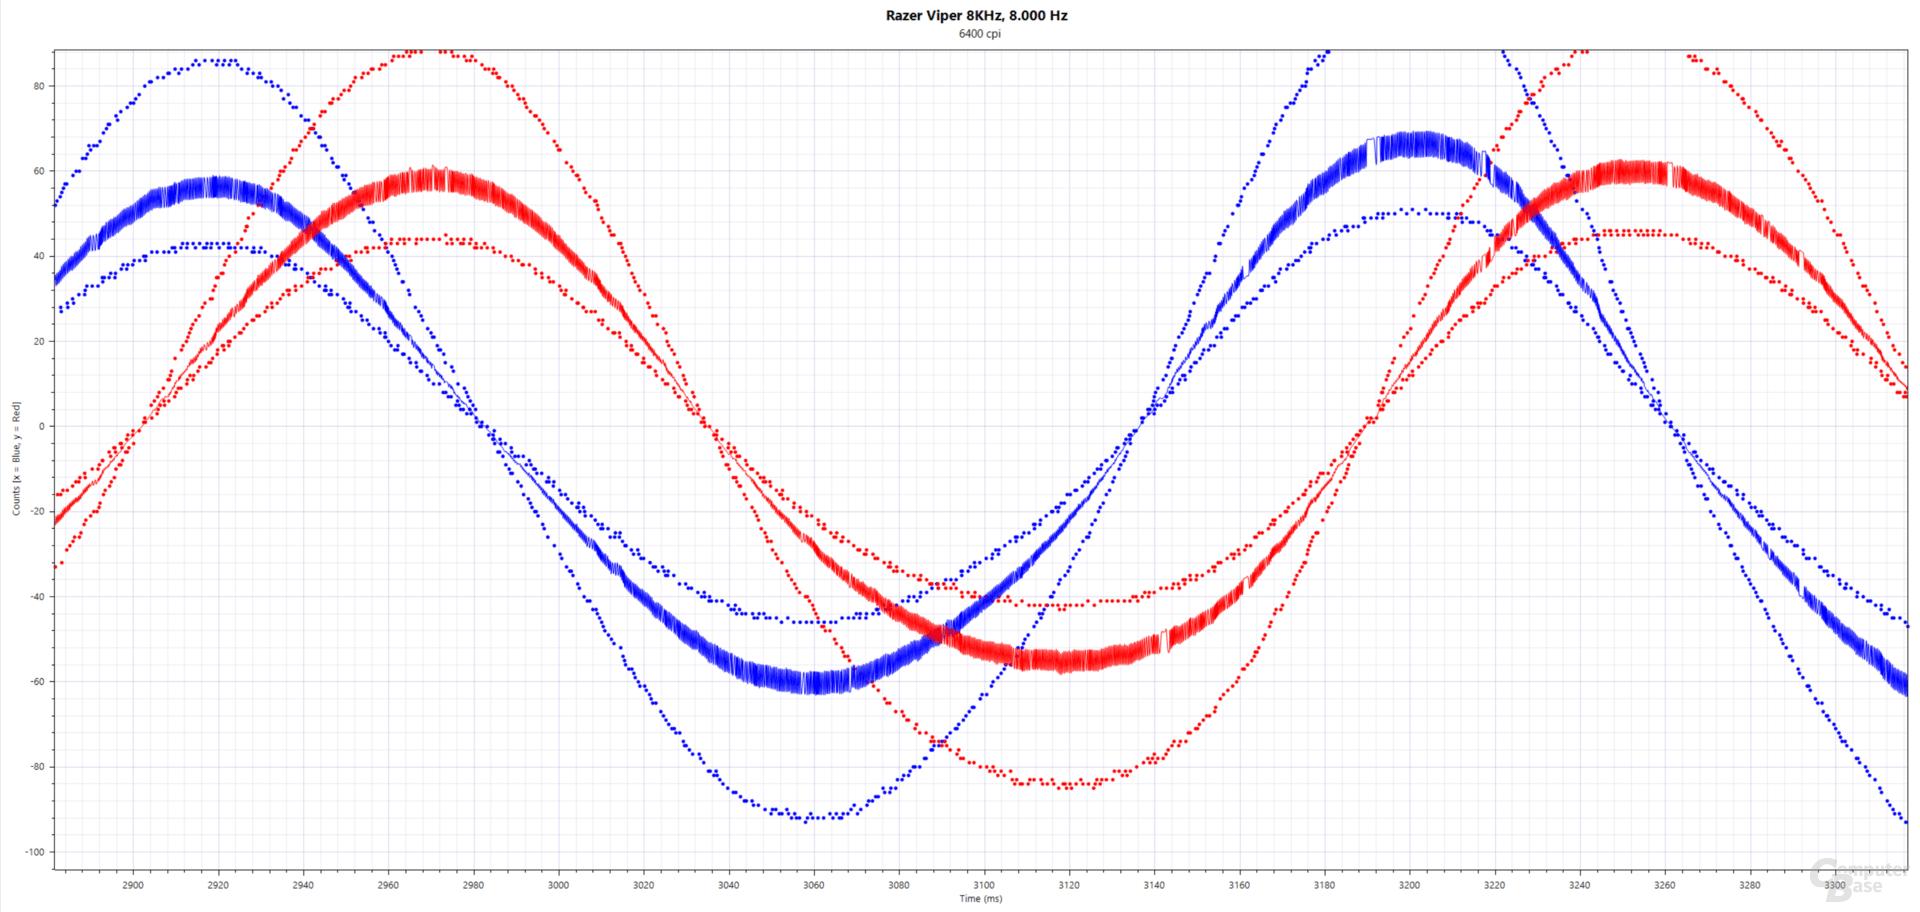 Blau: xCounts(ms), Rot: yCounts(ms); Razer Viper 8KHz (PMW-3399, 6.400 cpi, 8.000 Hertz, Stoffmauspad)